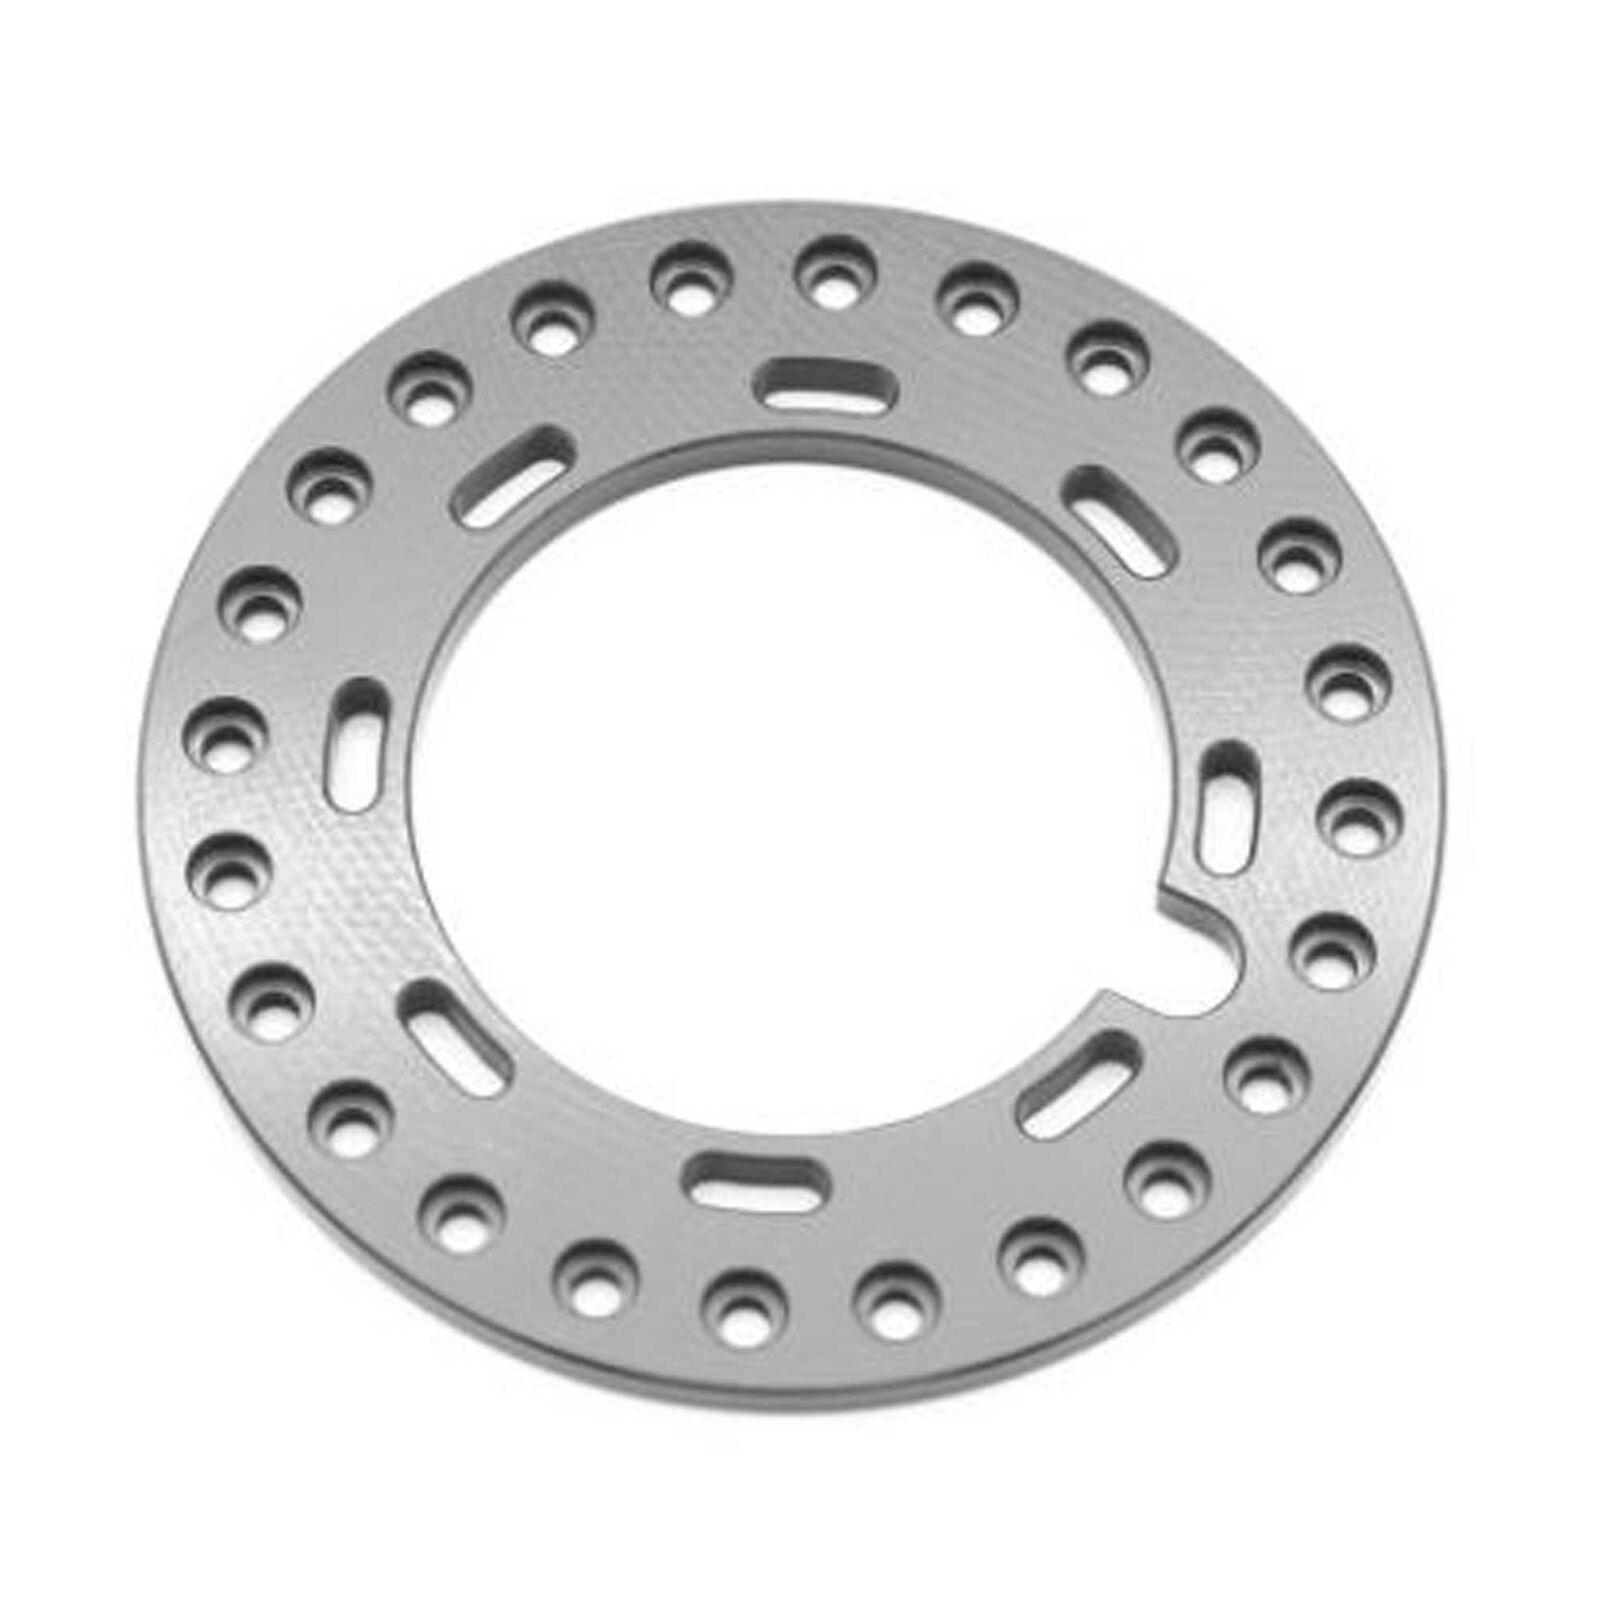 1.9 IBTR Beadlock Grey Anodized